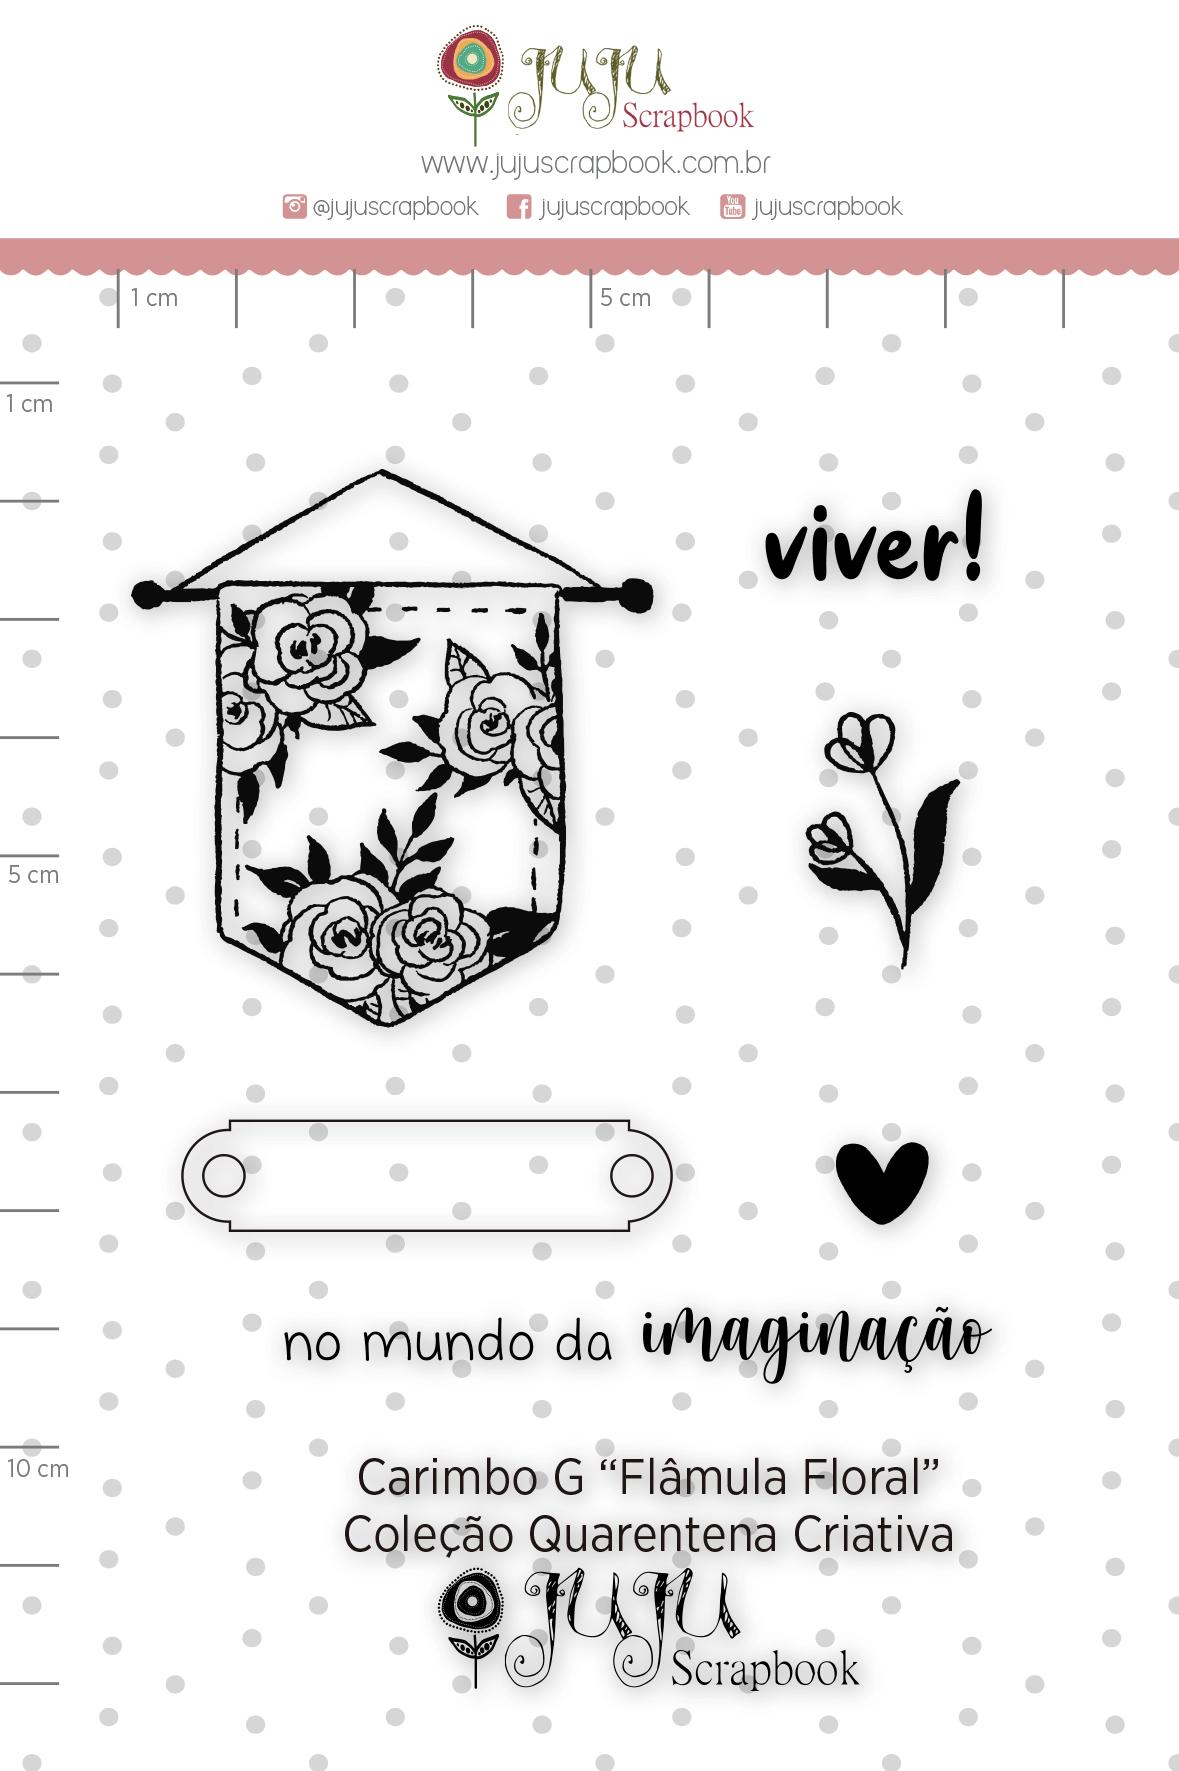 Carimbo G Flâmula Floral - Coleção Quarentena Criativa - Juju Scrapbook  - JuJu Scrapbook